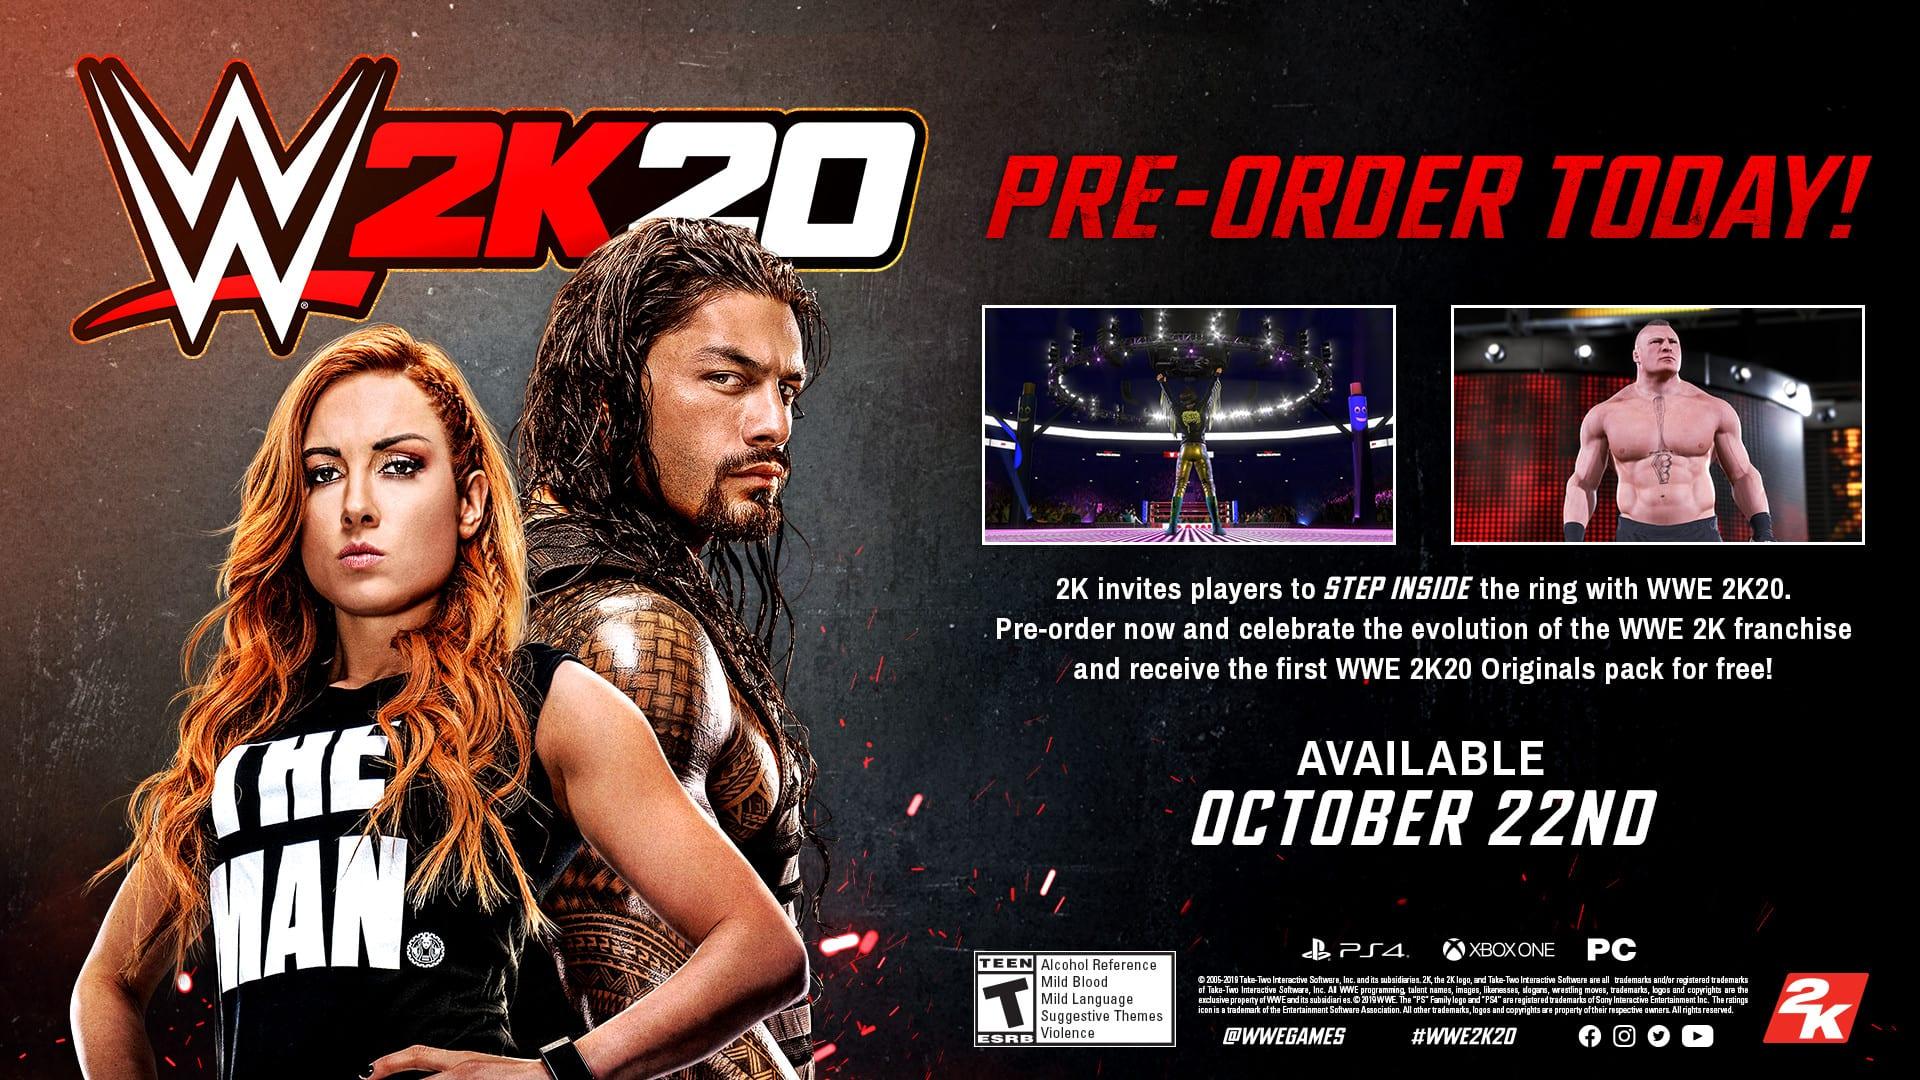 WWE 2k20 Pre-order Bonus